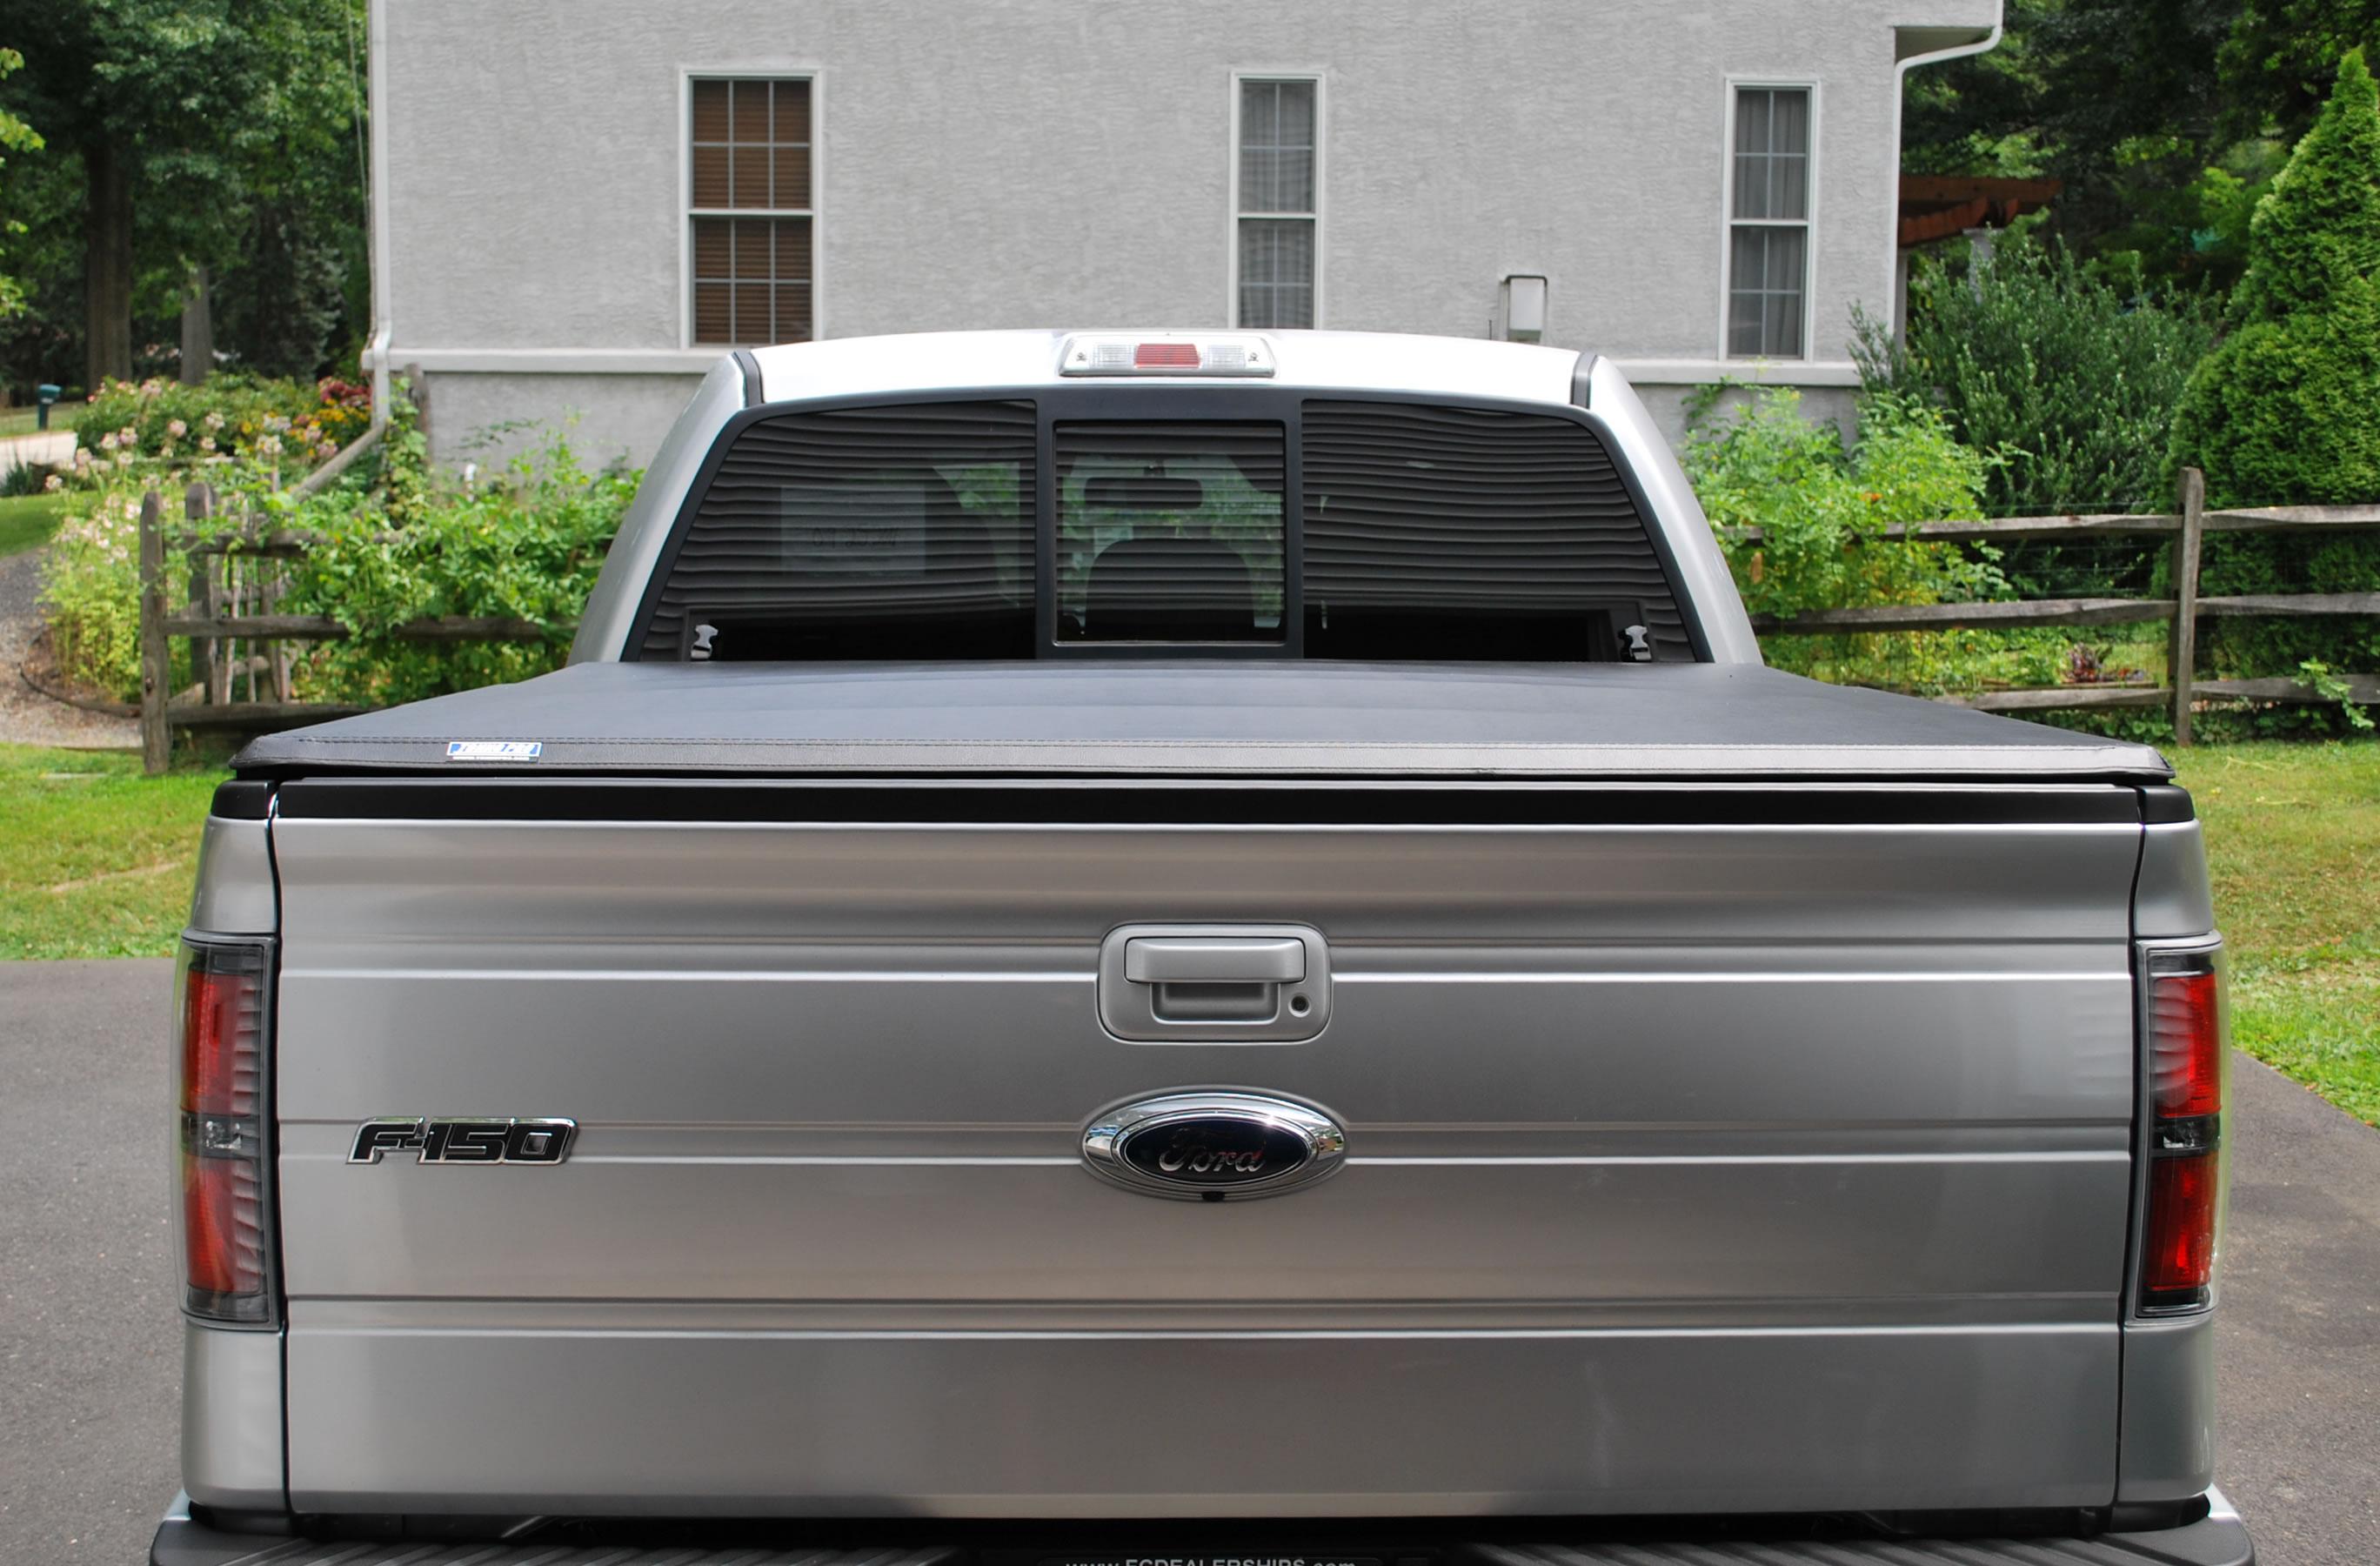 sierra cover covers tonneau tonnomax gmc tri low design profile bed soft sleek trifold fold